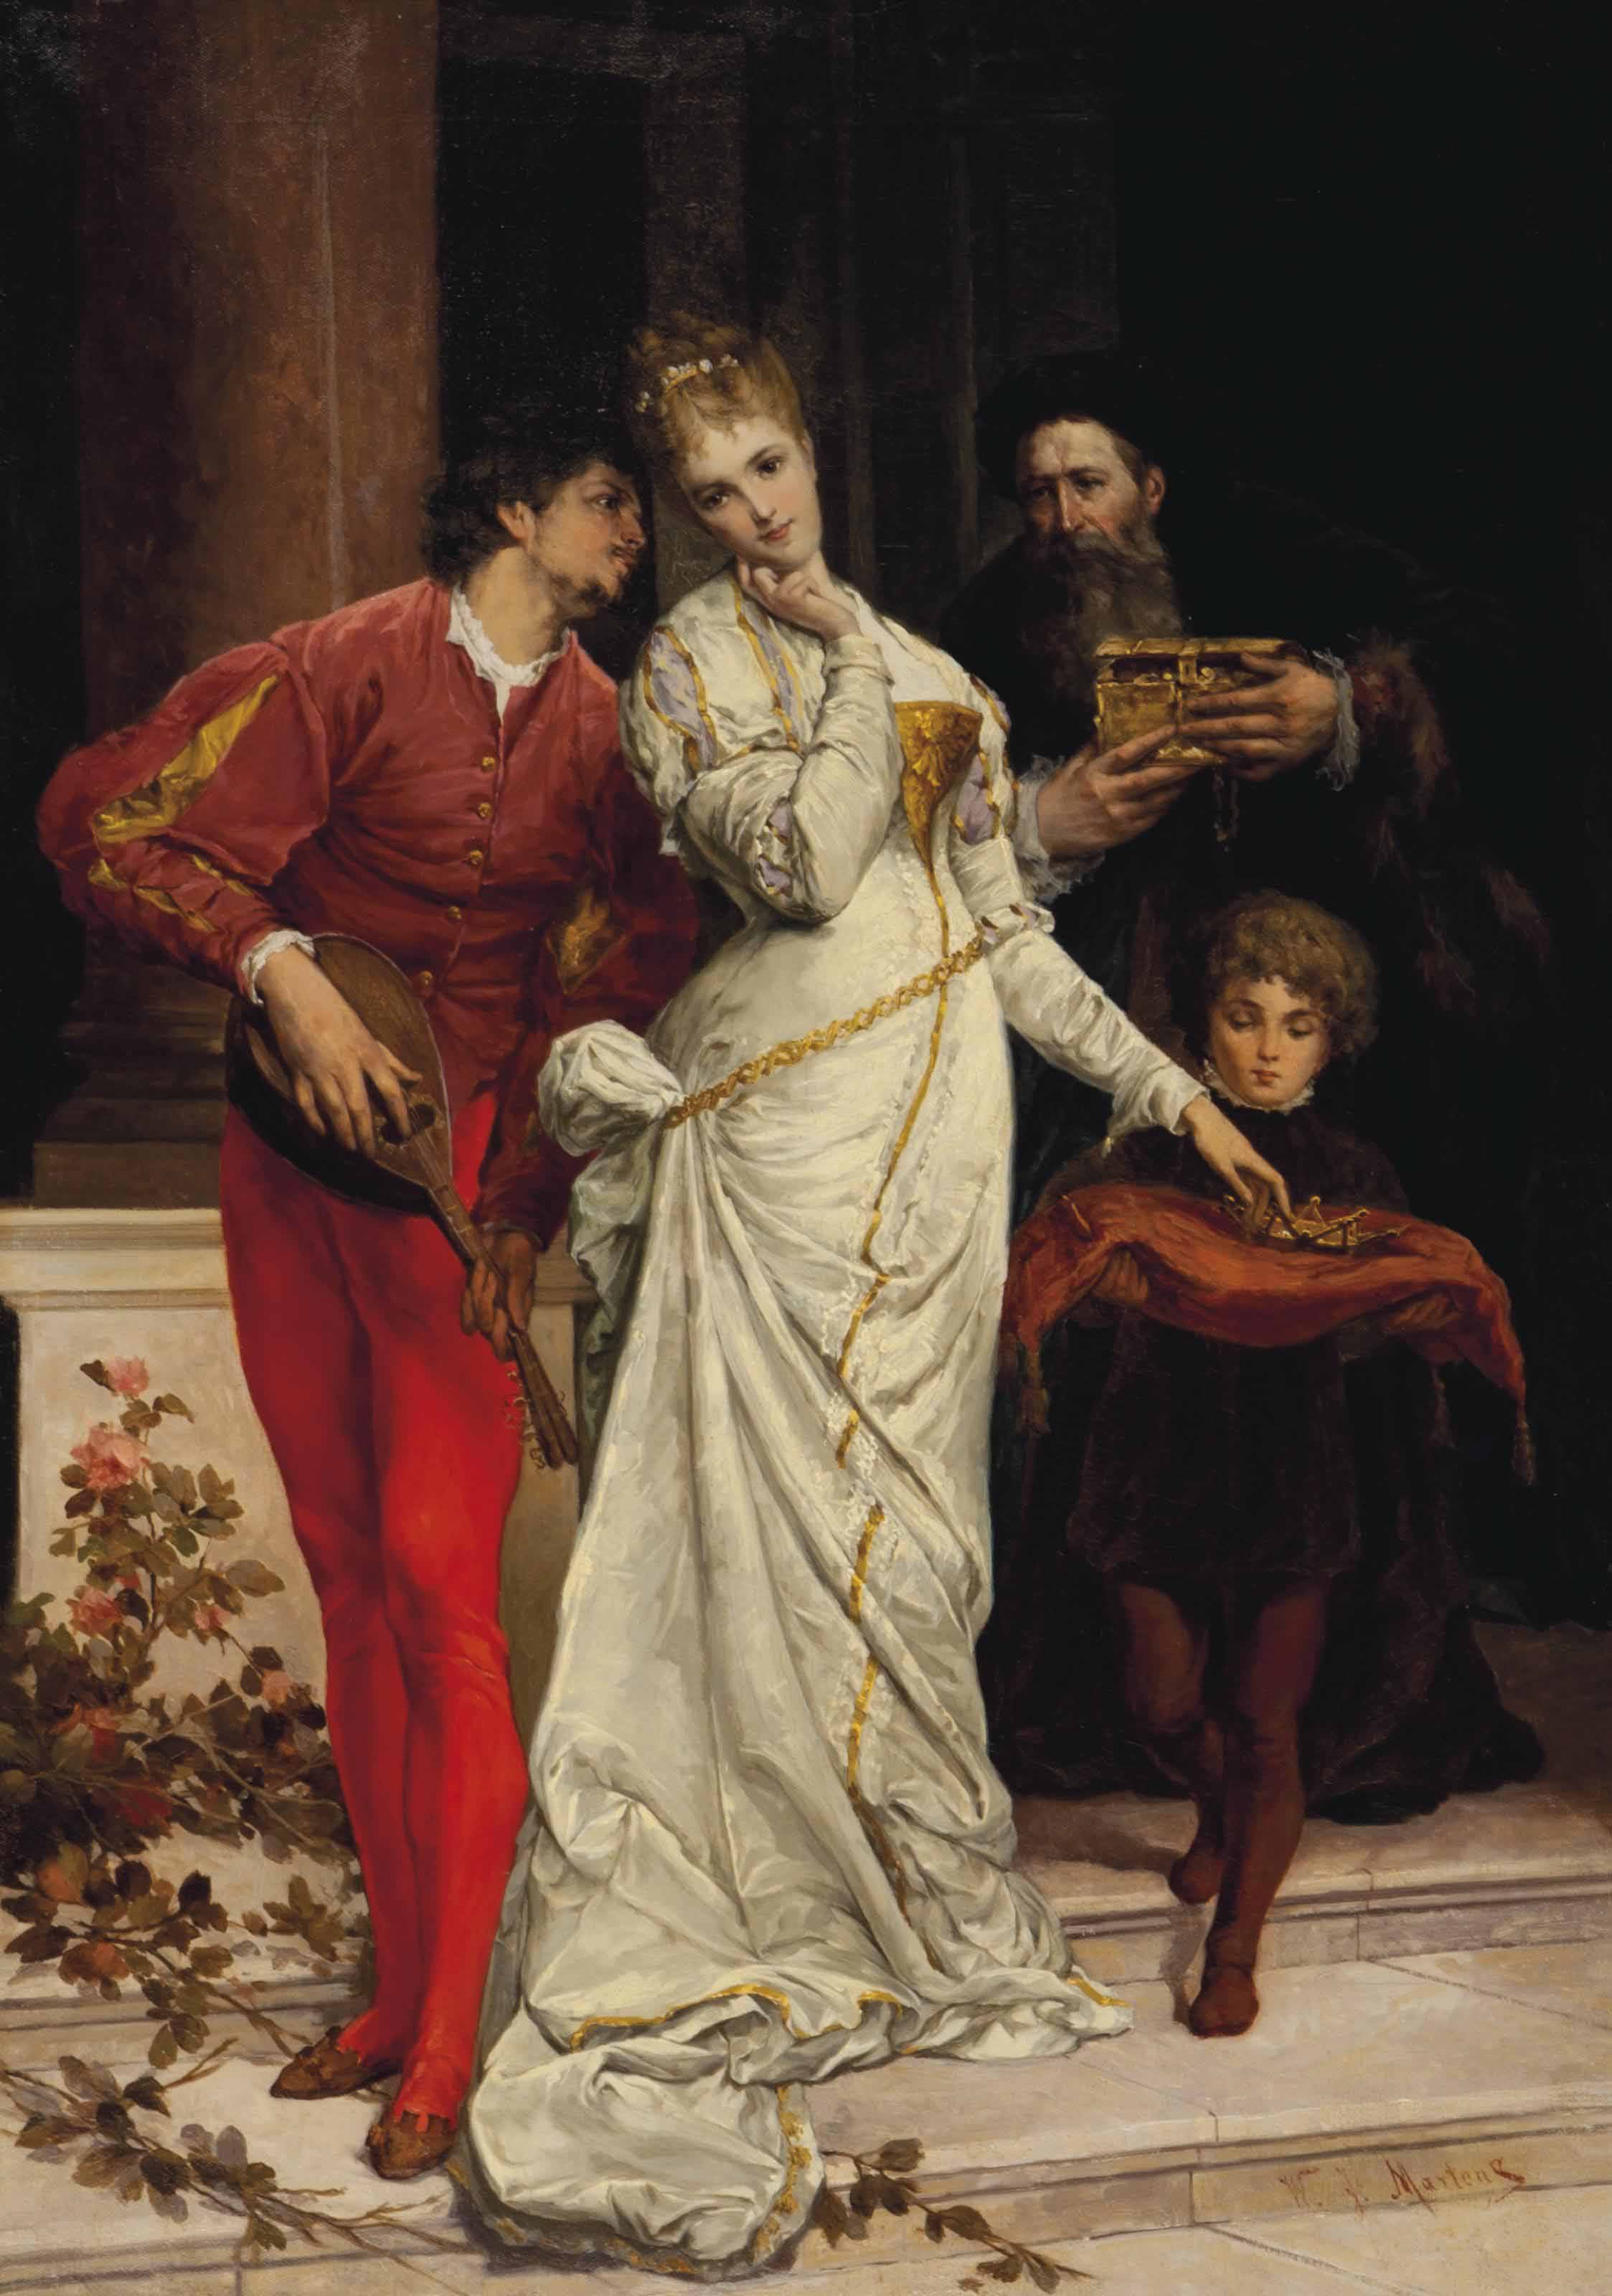 An elegant courtship